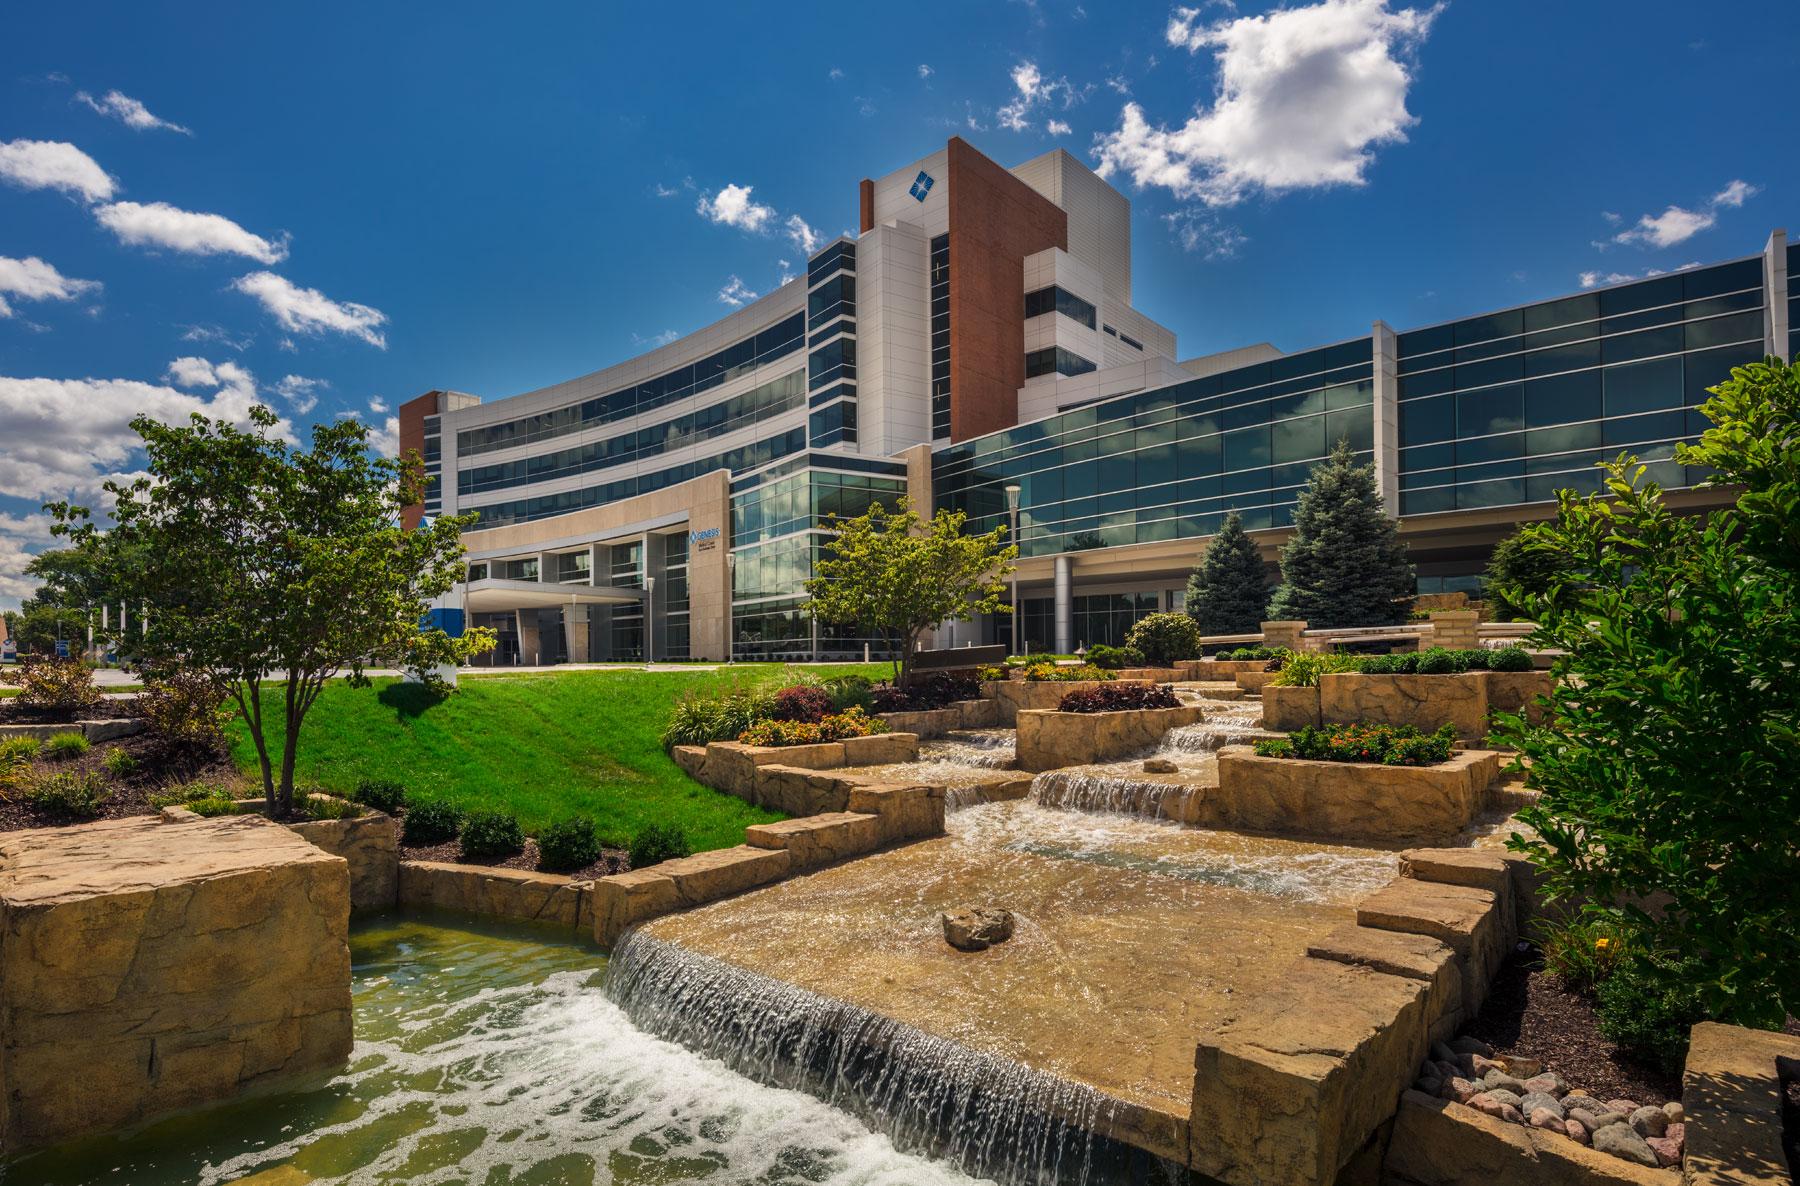 Genesis Health System - East Hospital Expansion